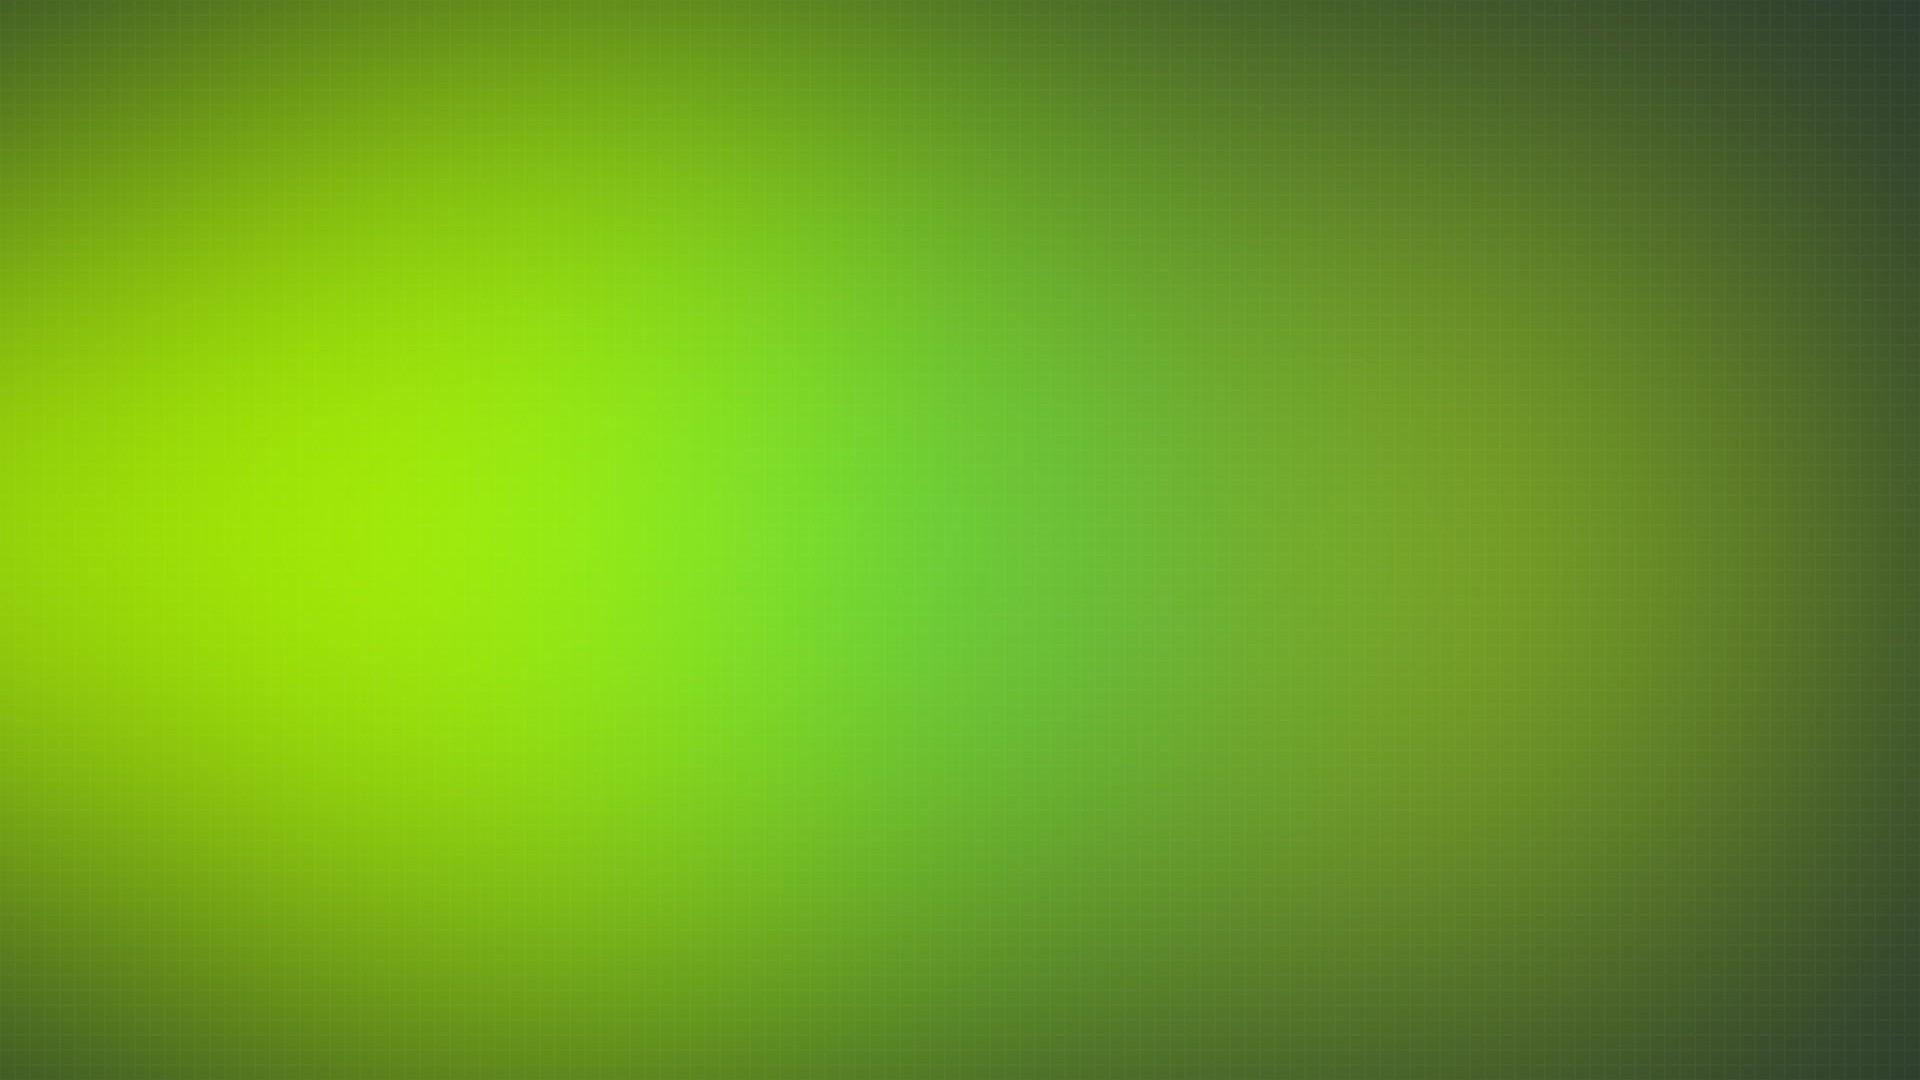 Lime Green Wallpaper HD 10 hd background hd screensavers hd wallpaper .